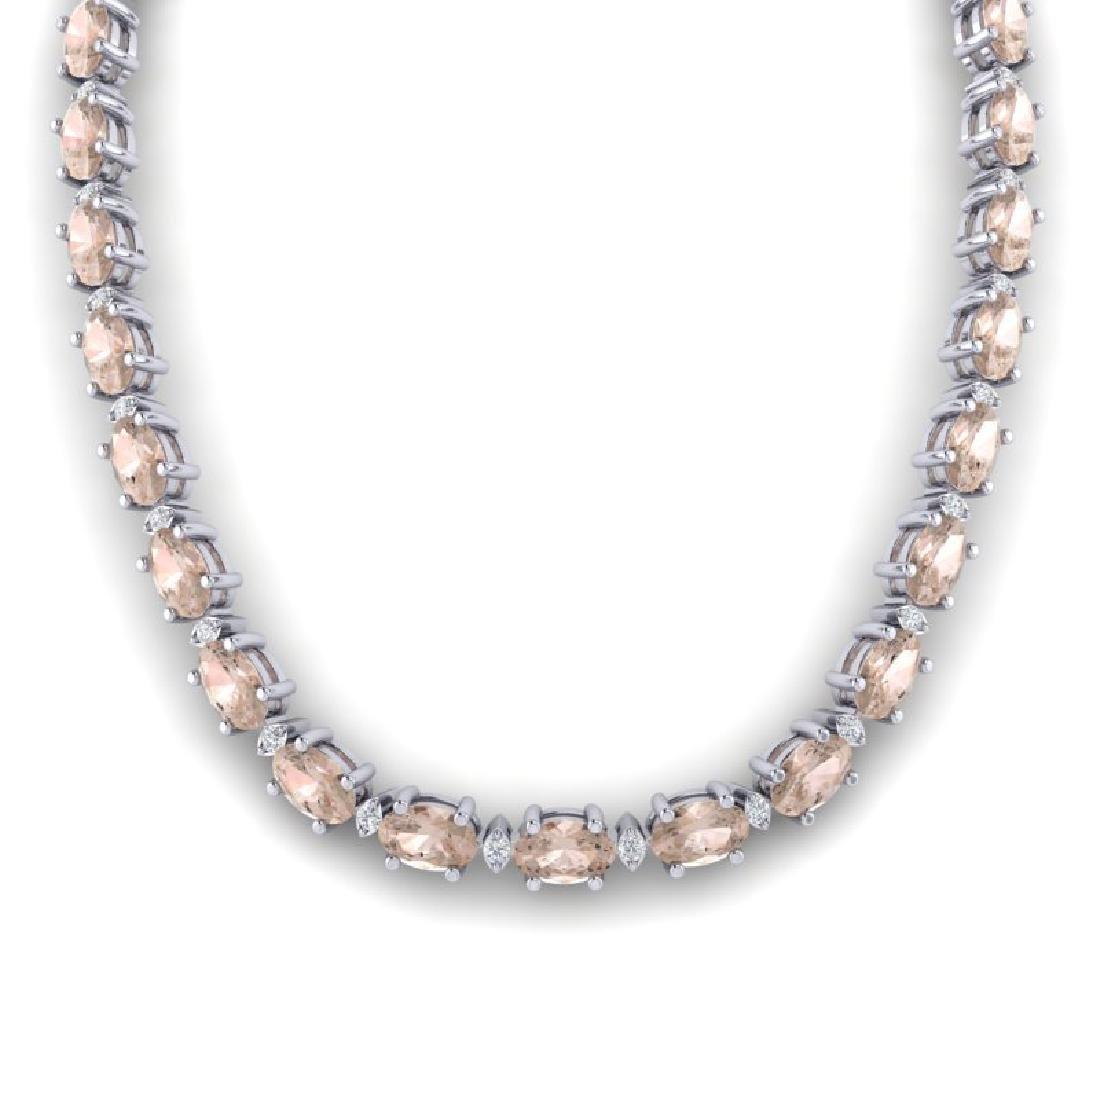 49.85 CTW Morganite & VS/SI Certified Diamond Necklace